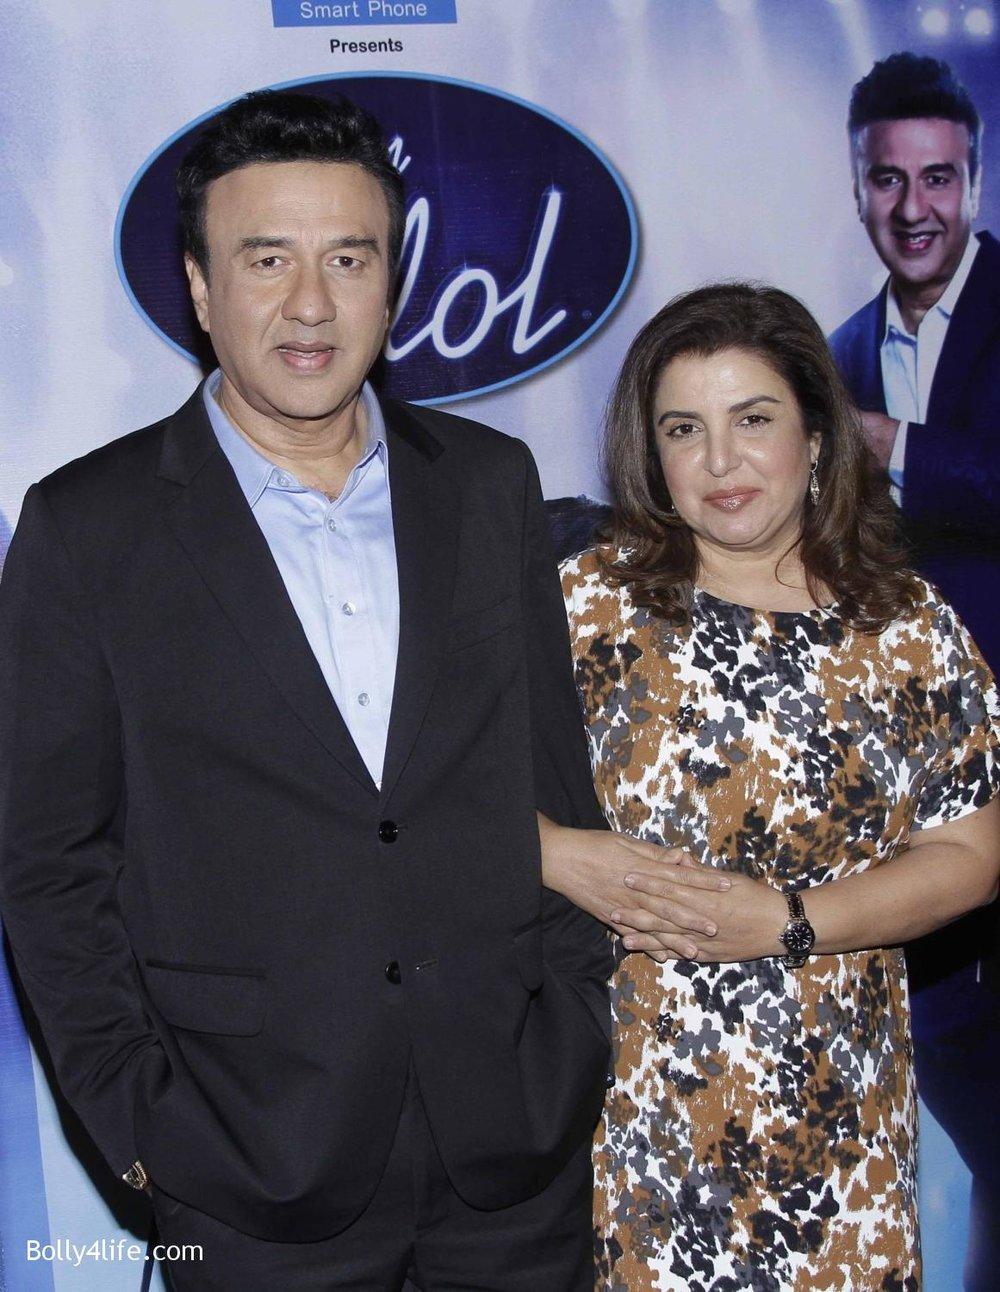 Anu-Malik-and-Director-Choreographer-Farah-Khan-during-a-press-conference-regarding-Indian-Idol-Season-7-1.jpg